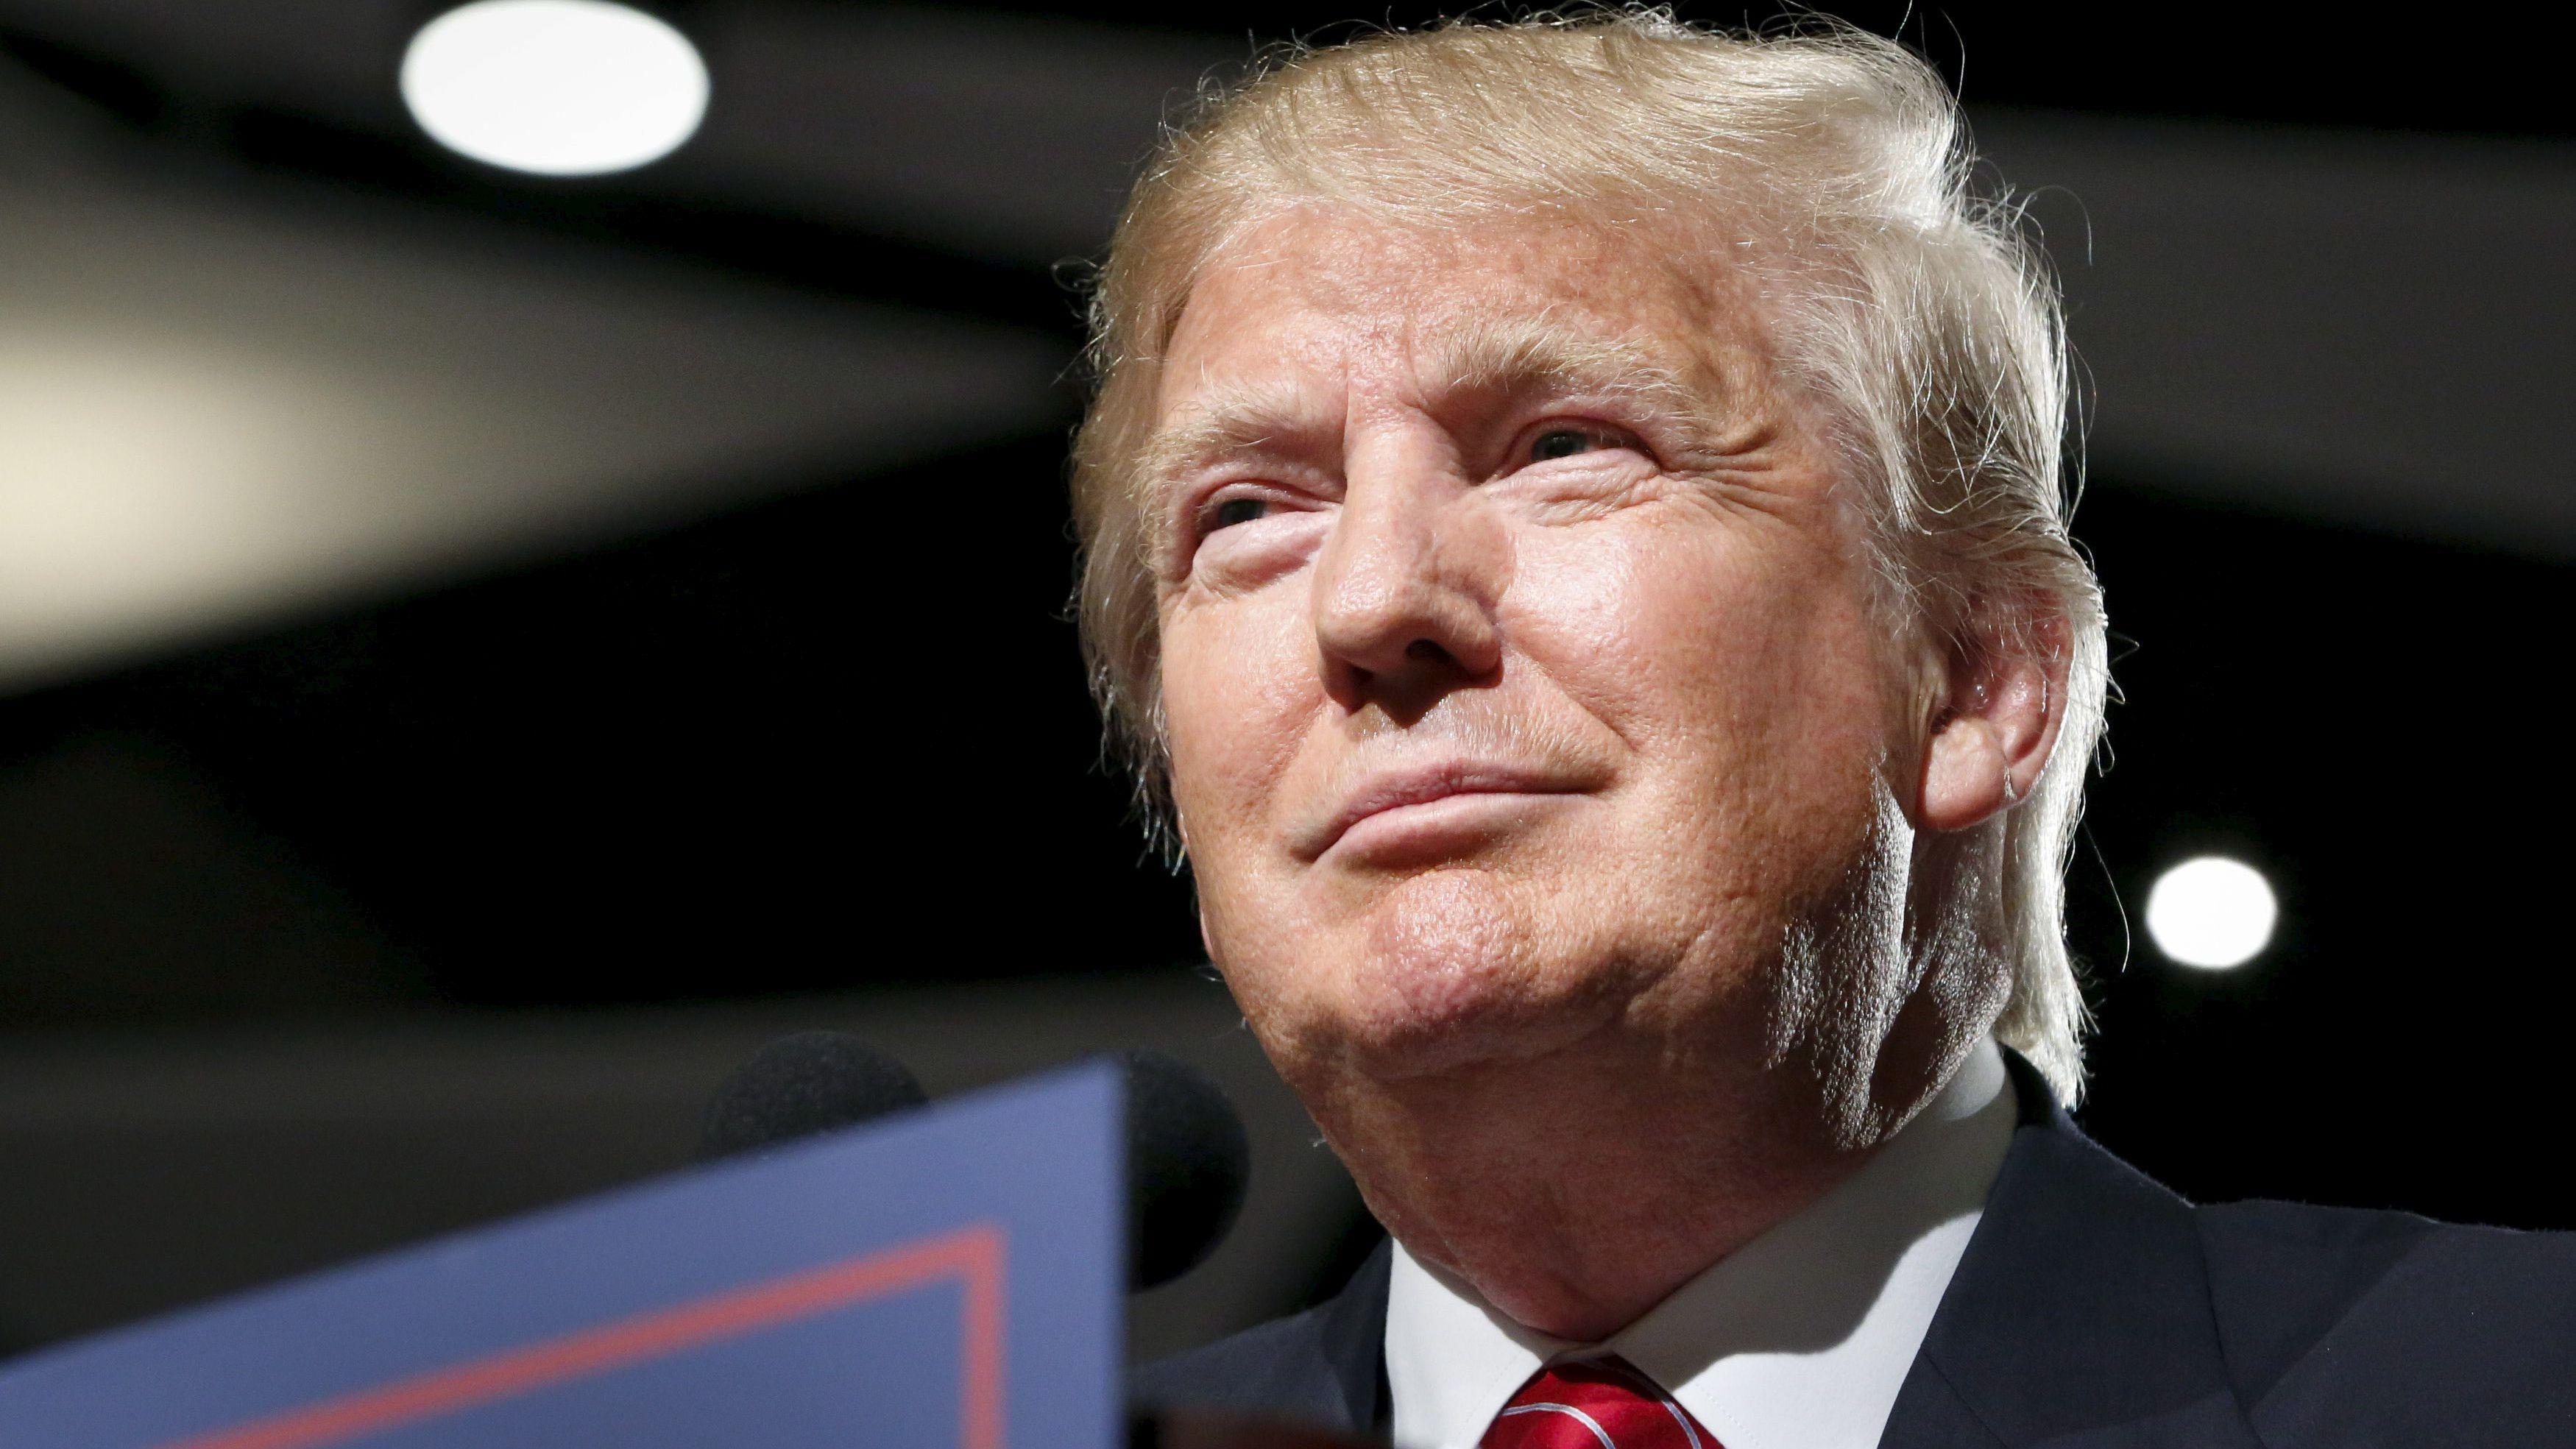 U.S. Republican presidential candidate Donald Trump holds a campaign event in Phoenix, Arizona July 11, 2015.